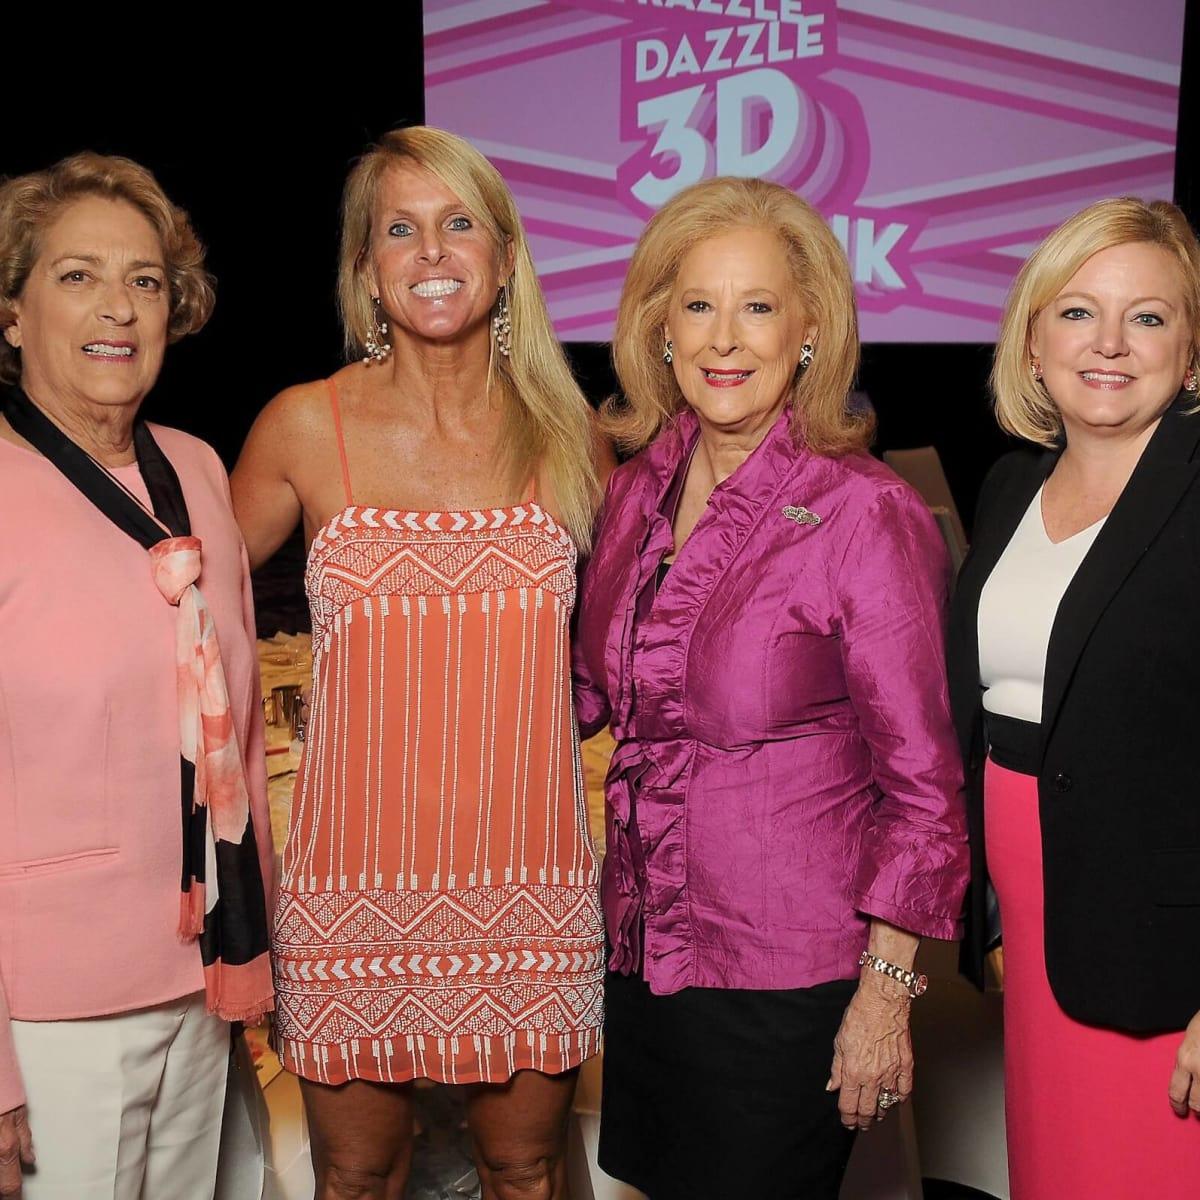 Memorial Hermann Razzle Dazzle lunch Honoree Mayor Pro Tem Ellen Cohen, author Elin Hilderbrand, Mary Ann McKeithan, Julie Voss